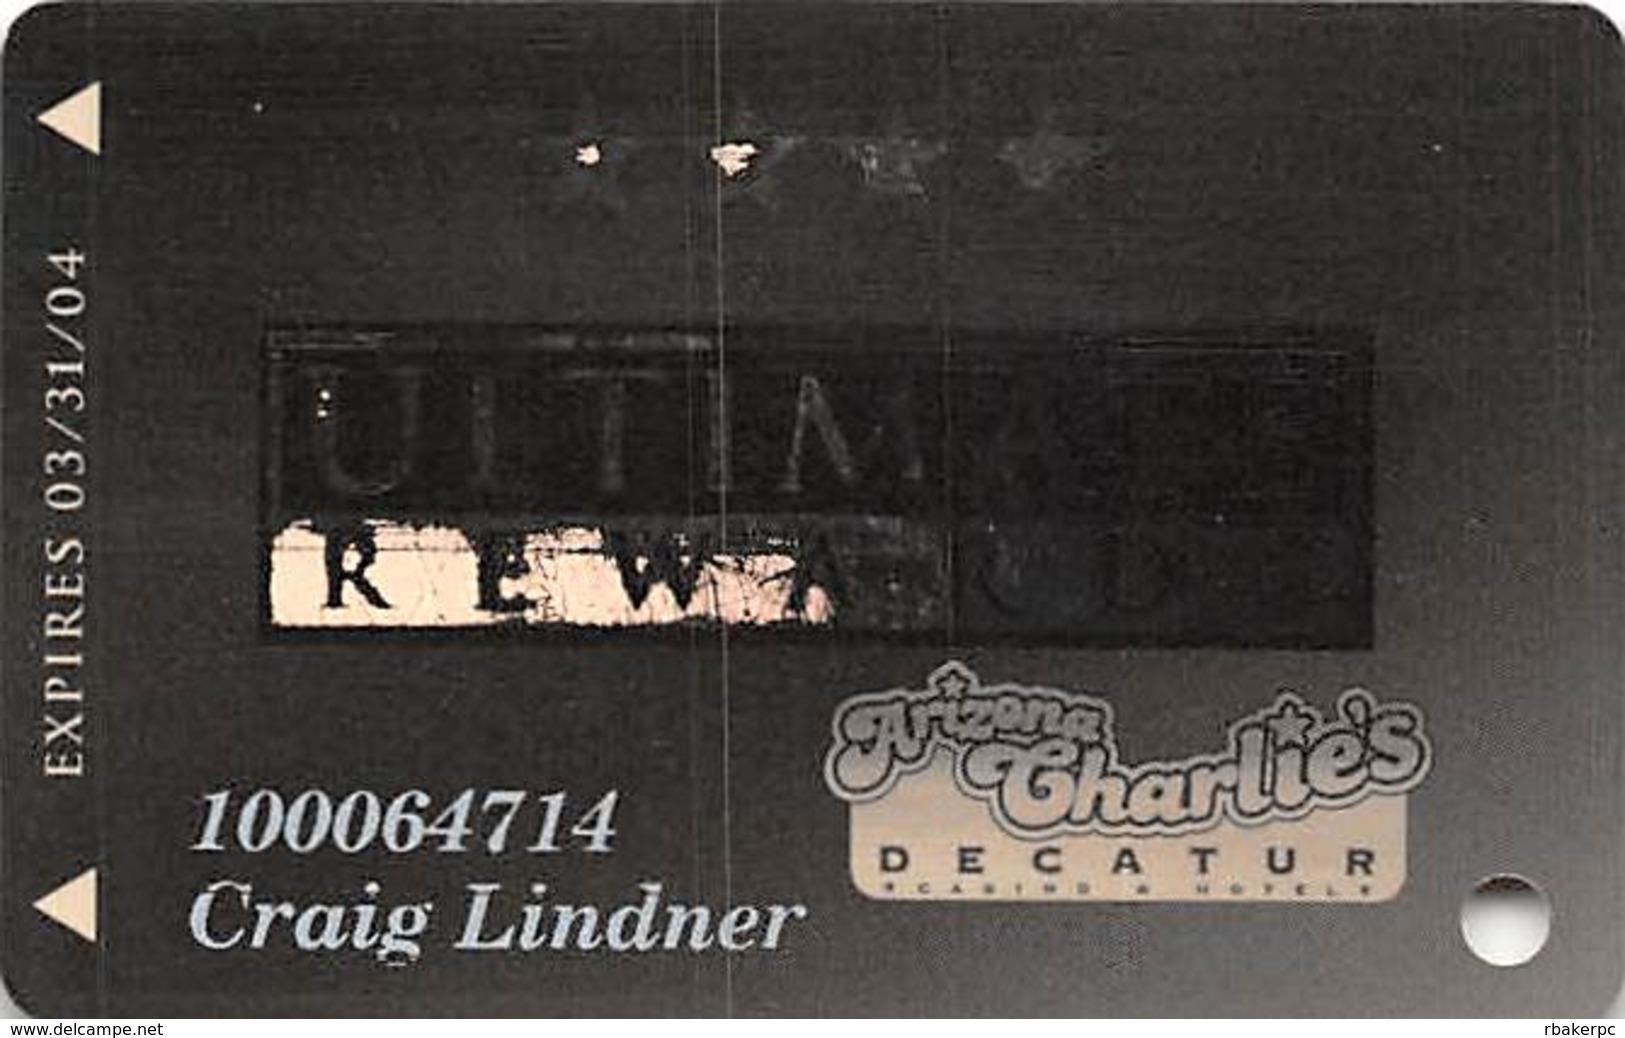 Arizona Charlie's West/Decatur Casino Las Vegas, NV - Slot Card - Casino Cards